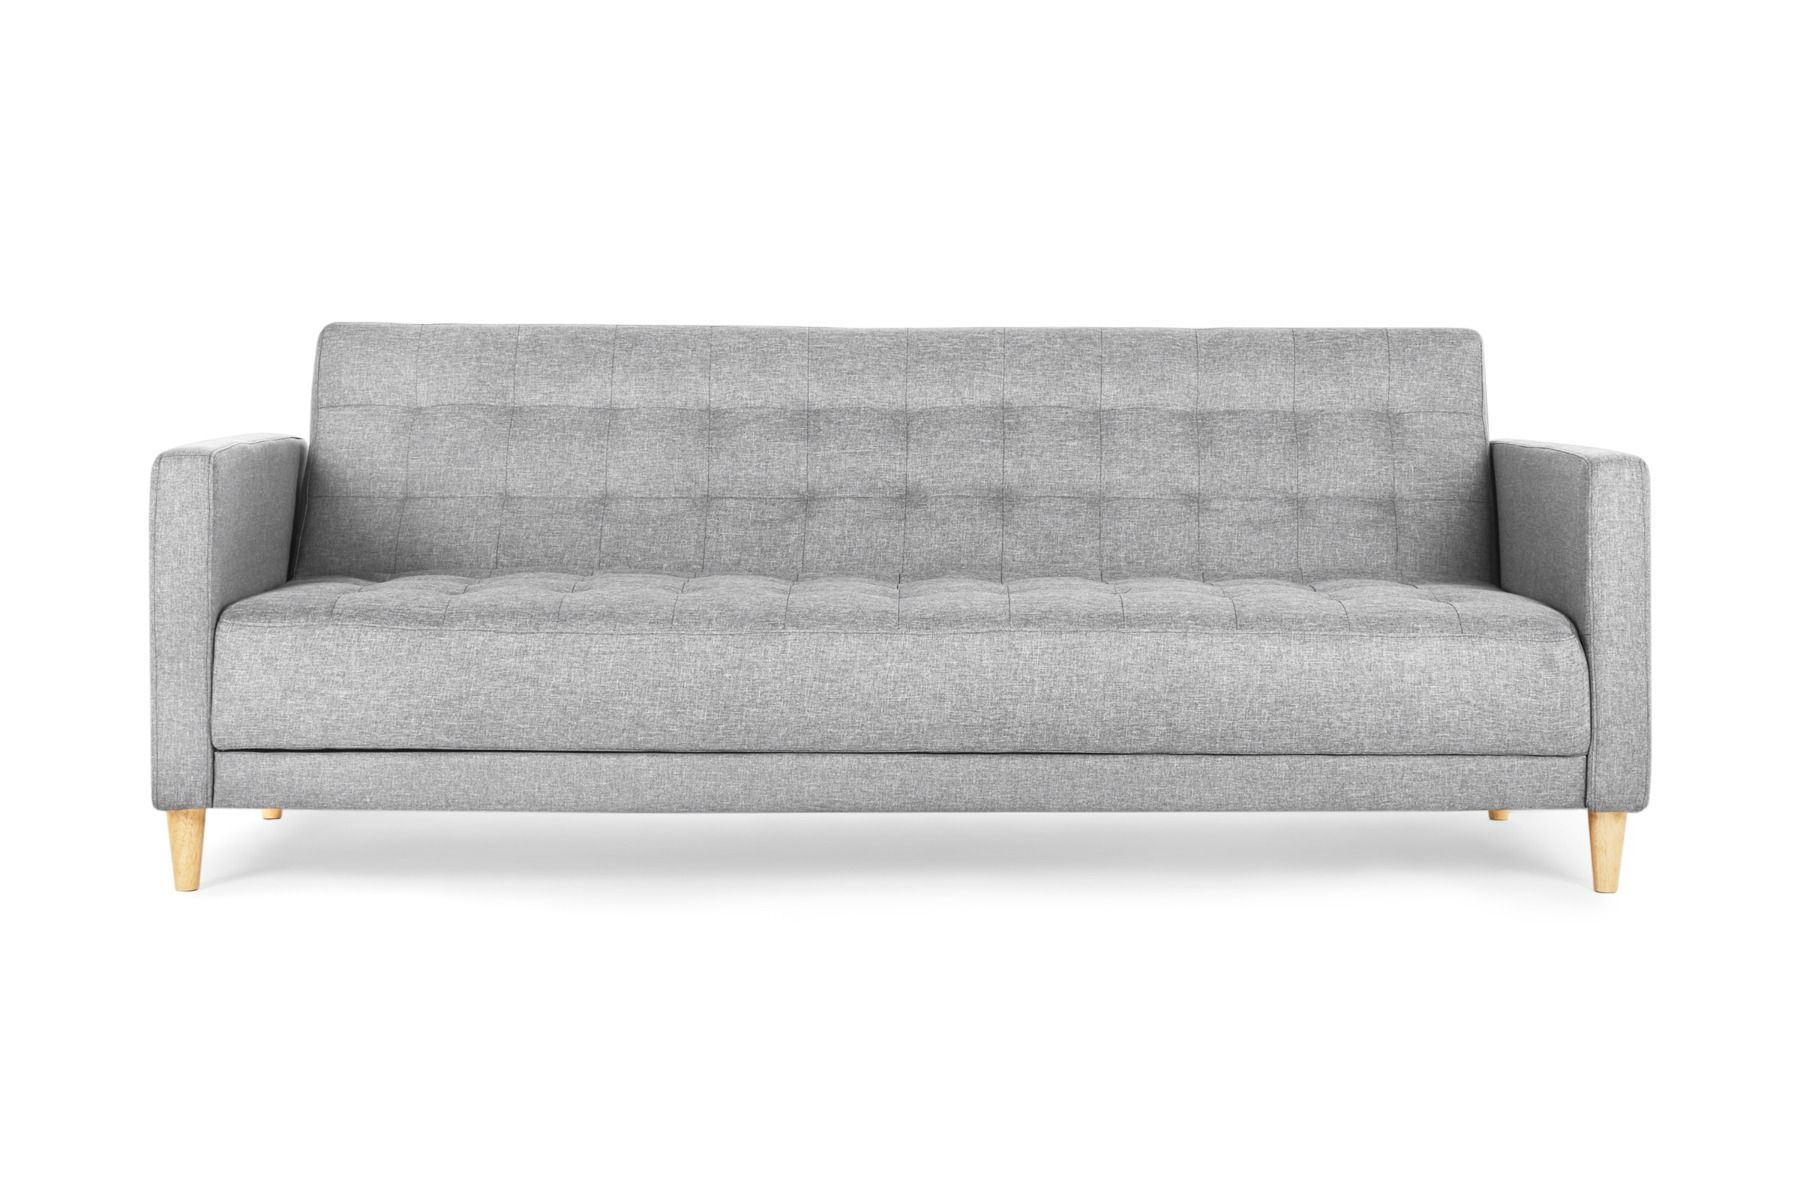 Alexis 3 seat sofa bed | 3 seat sofa bed, Sofa bed lounge ...